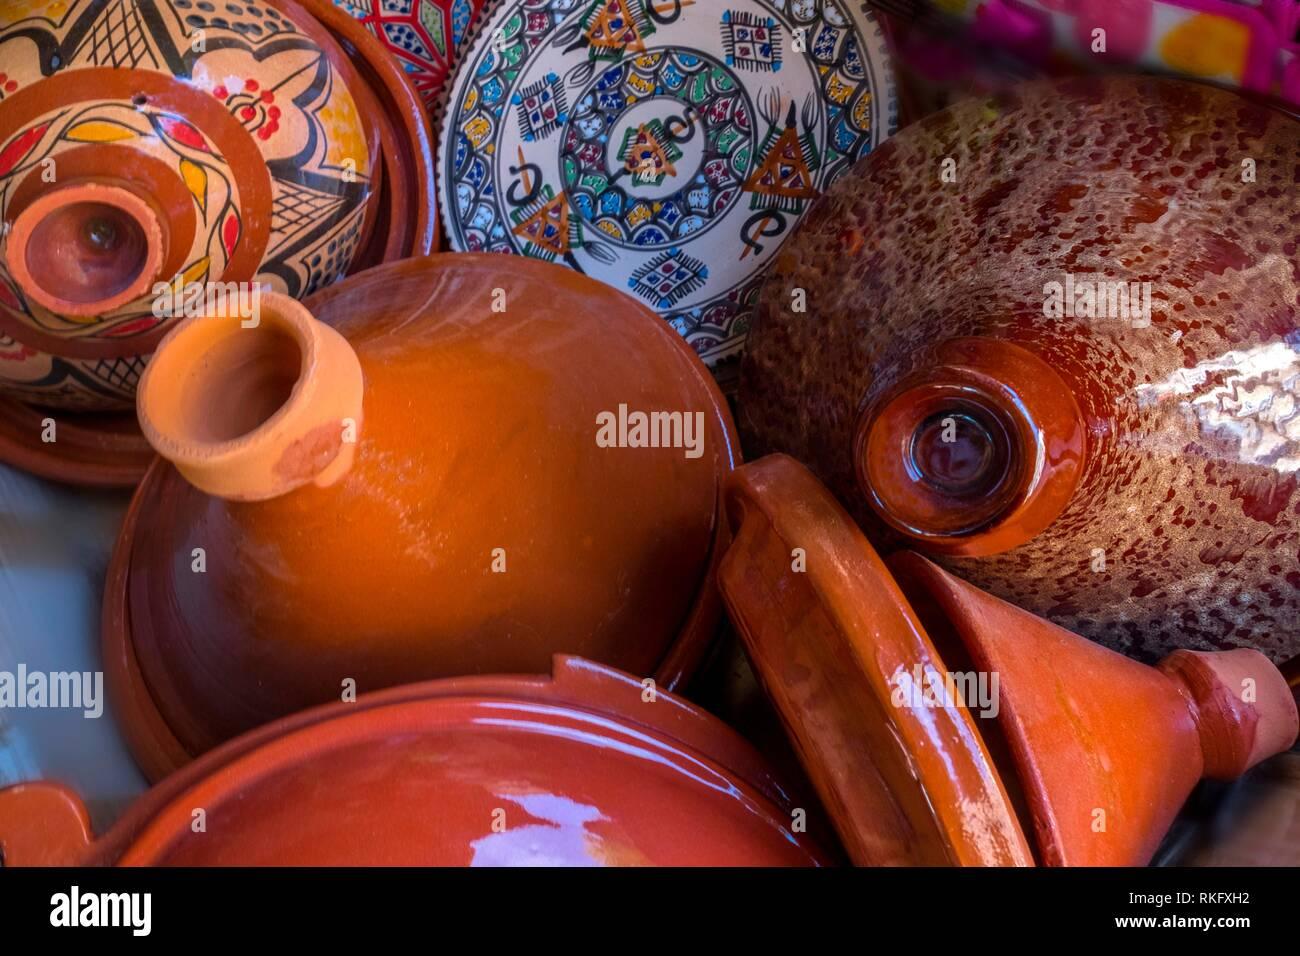 Morocco, Handicraft, typical ceramics plates. - Stock Image